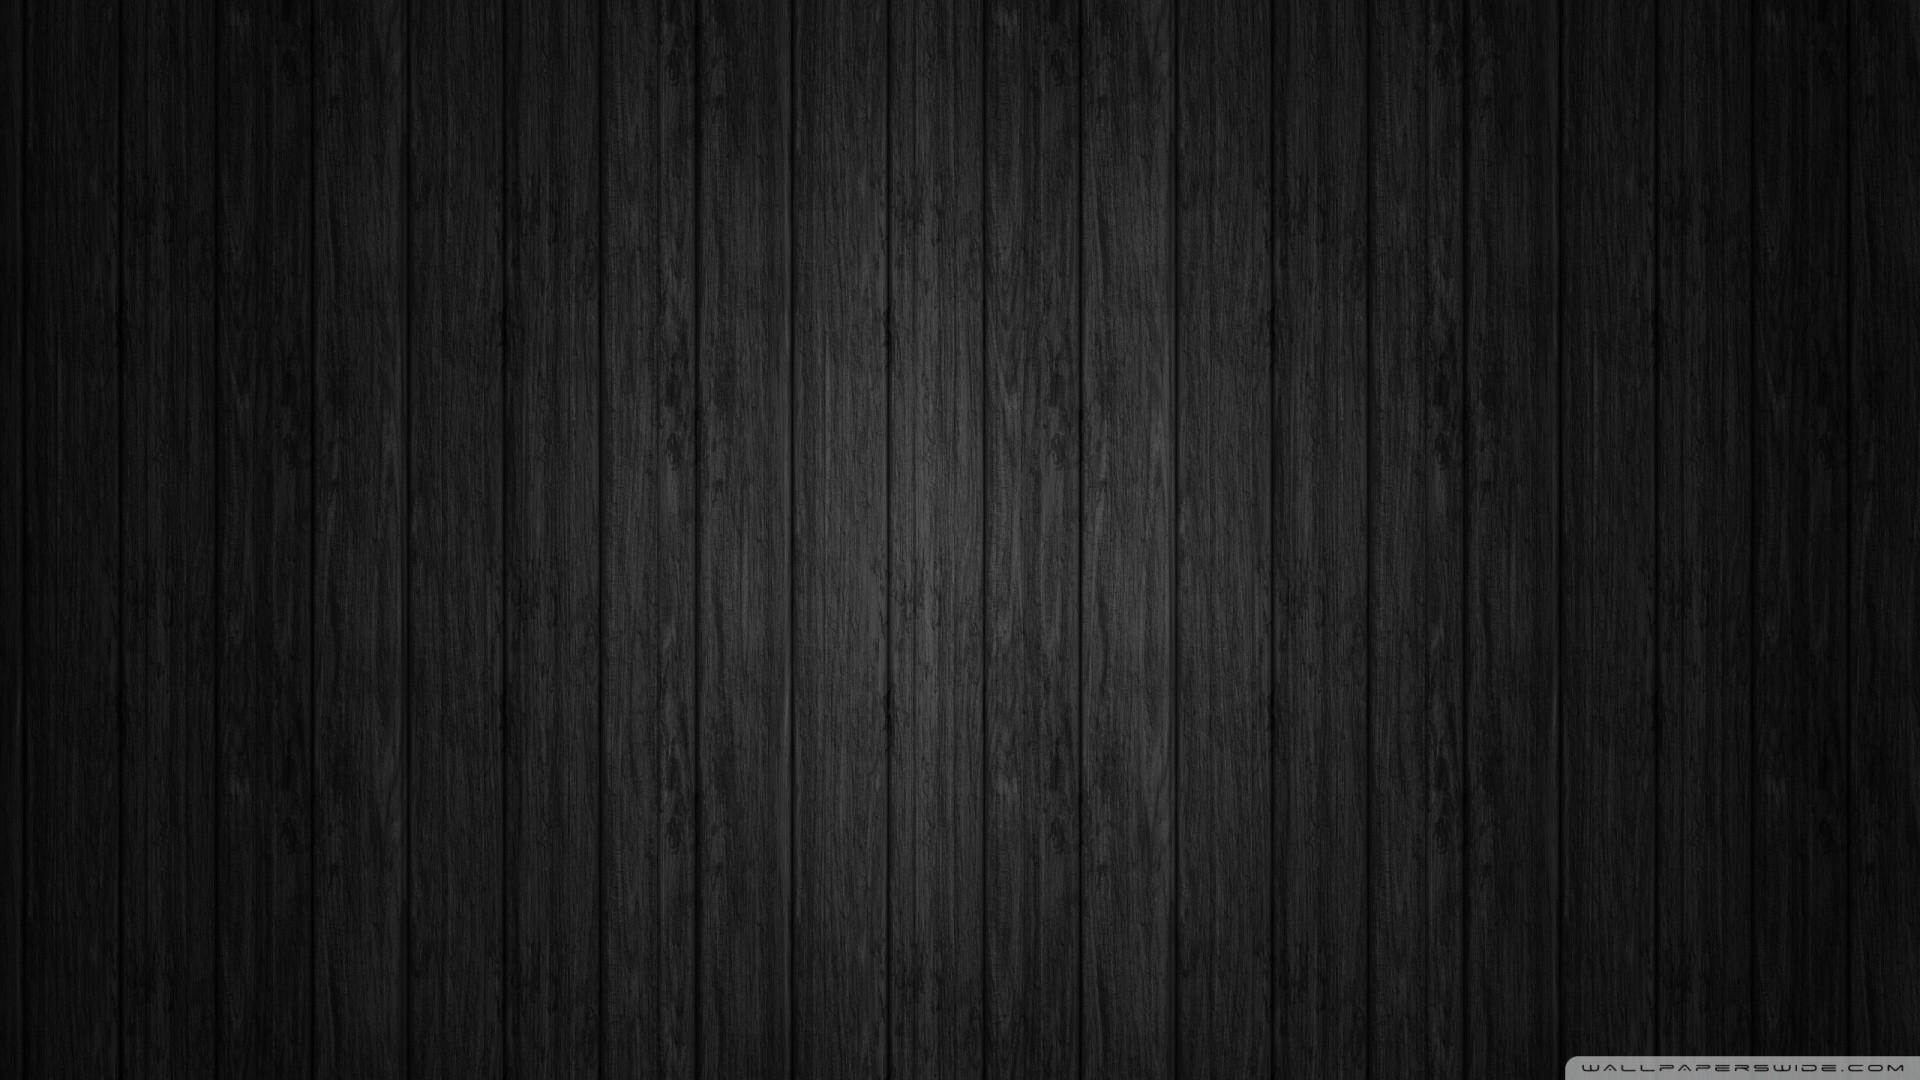 Black Hd Wallpaper 16 Free Hd Wallpaper. Black Hd Wallpaper  16 Free Hd Wallpaper